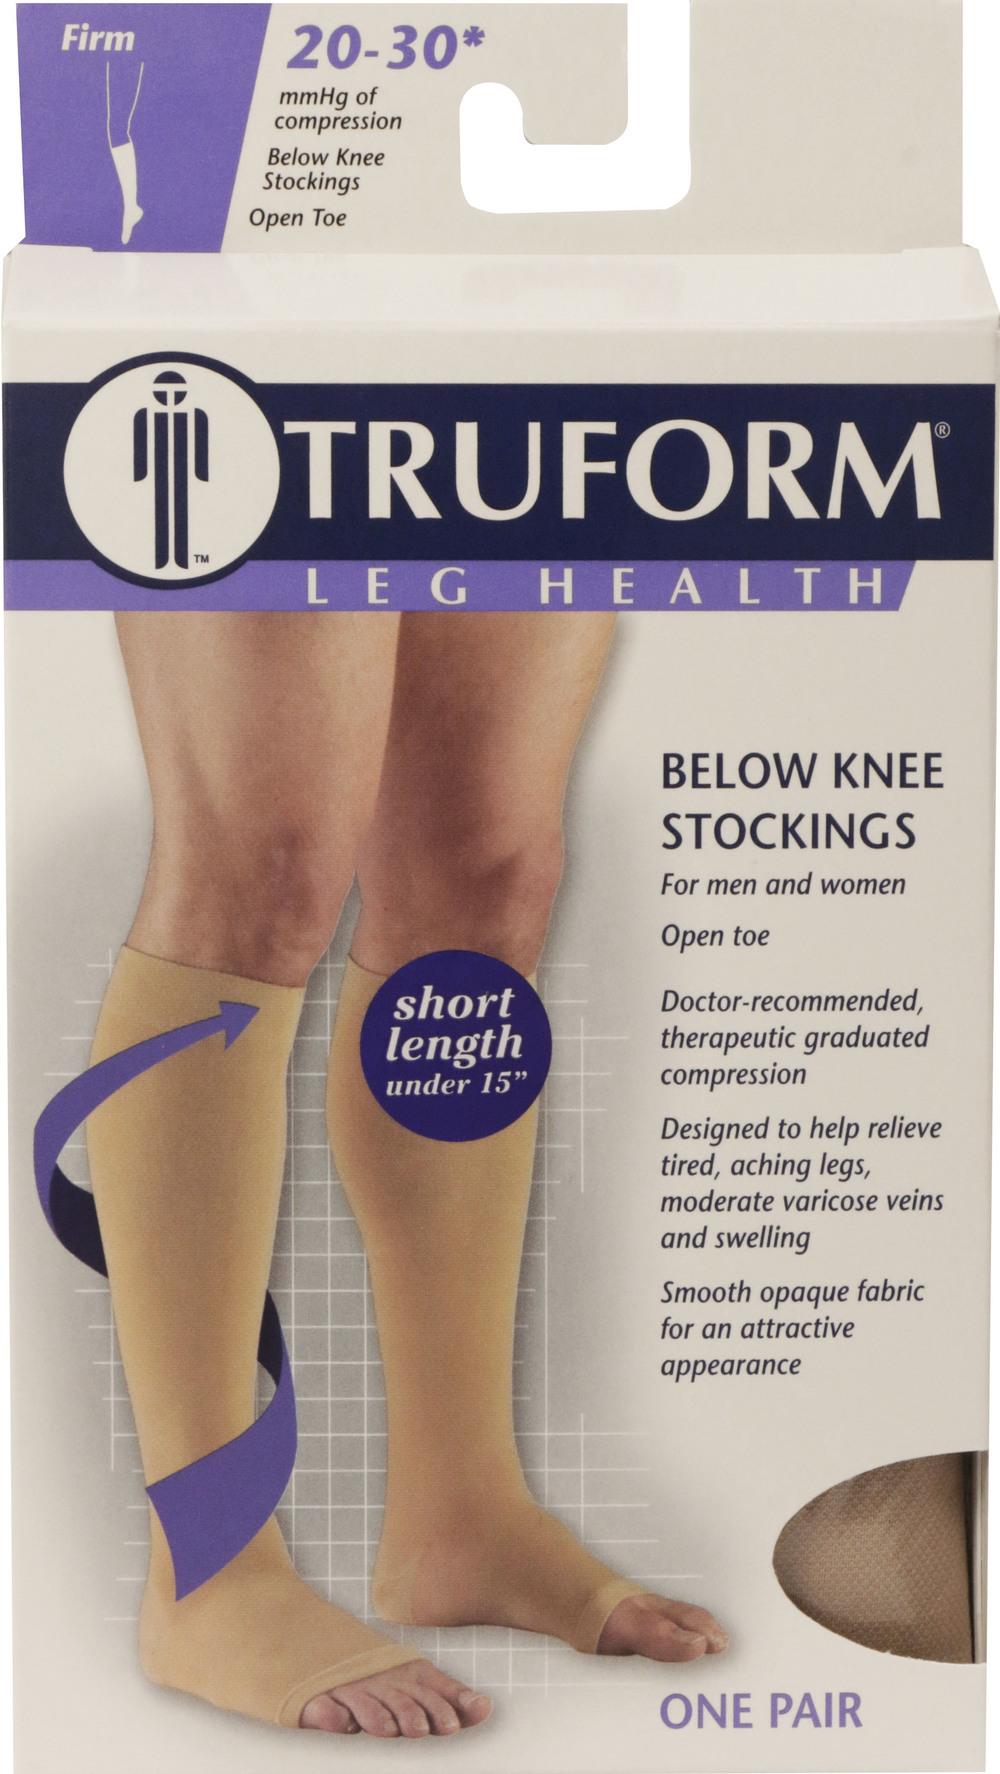 Truform, 0865s, 20-30 mmHg, Soft Top, Open Toe, Knee High, Short Length, Stockings, Package